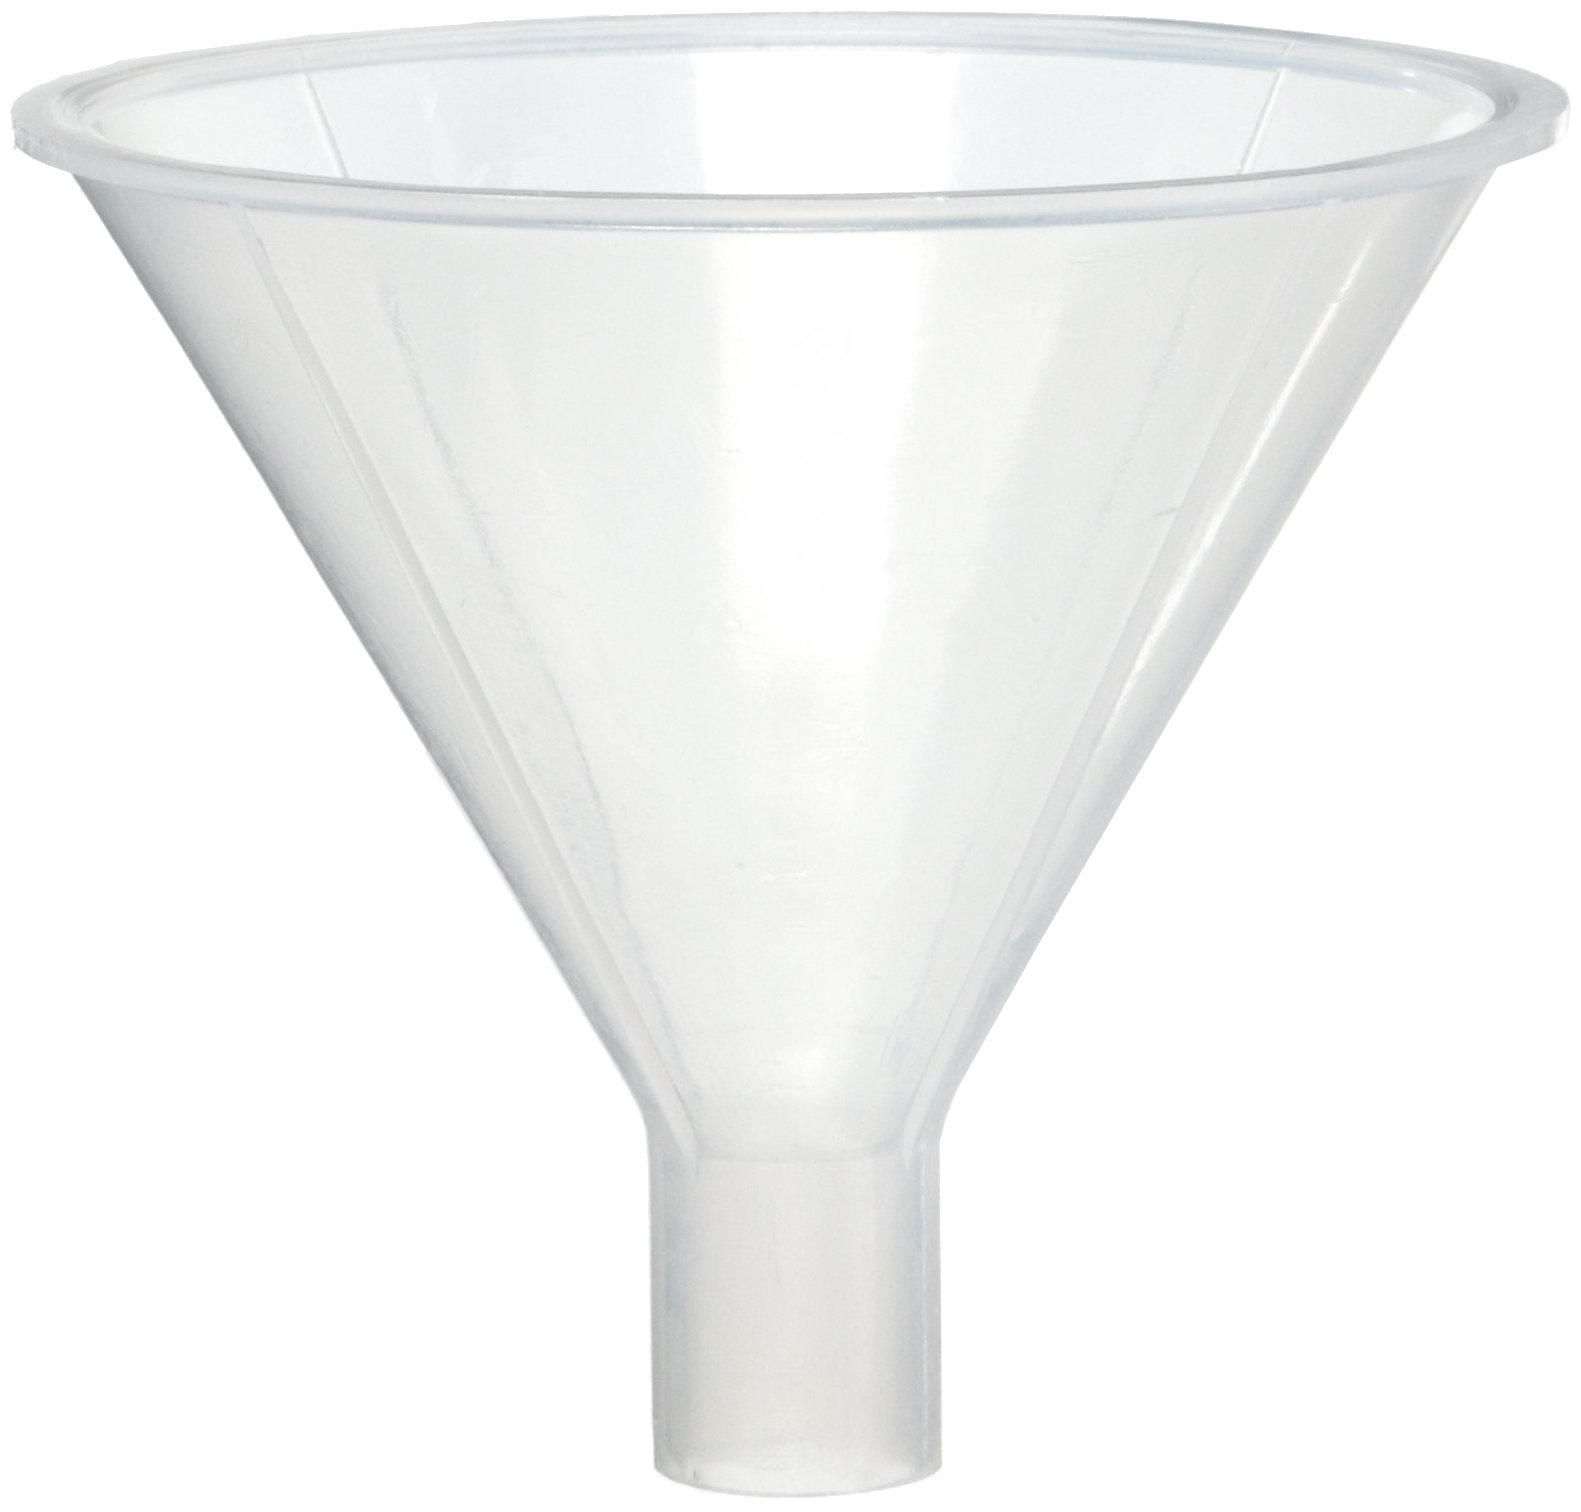 Bel-Art Polypropylene 248ml Powder Funnels (Pack of 6) (H14660-0100)